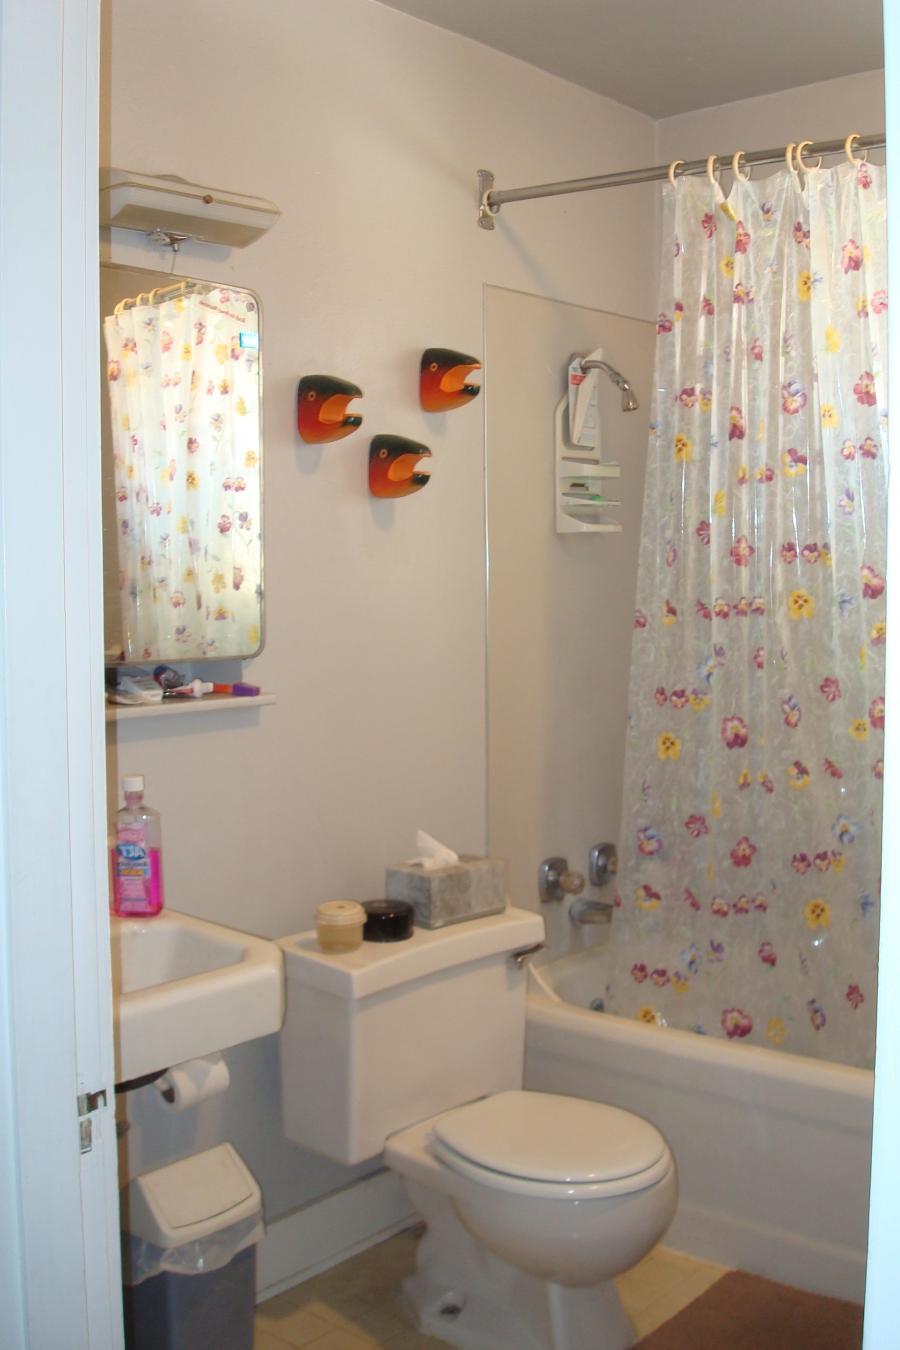 Simple bathroom designs photos for Simple bathroom designs photos